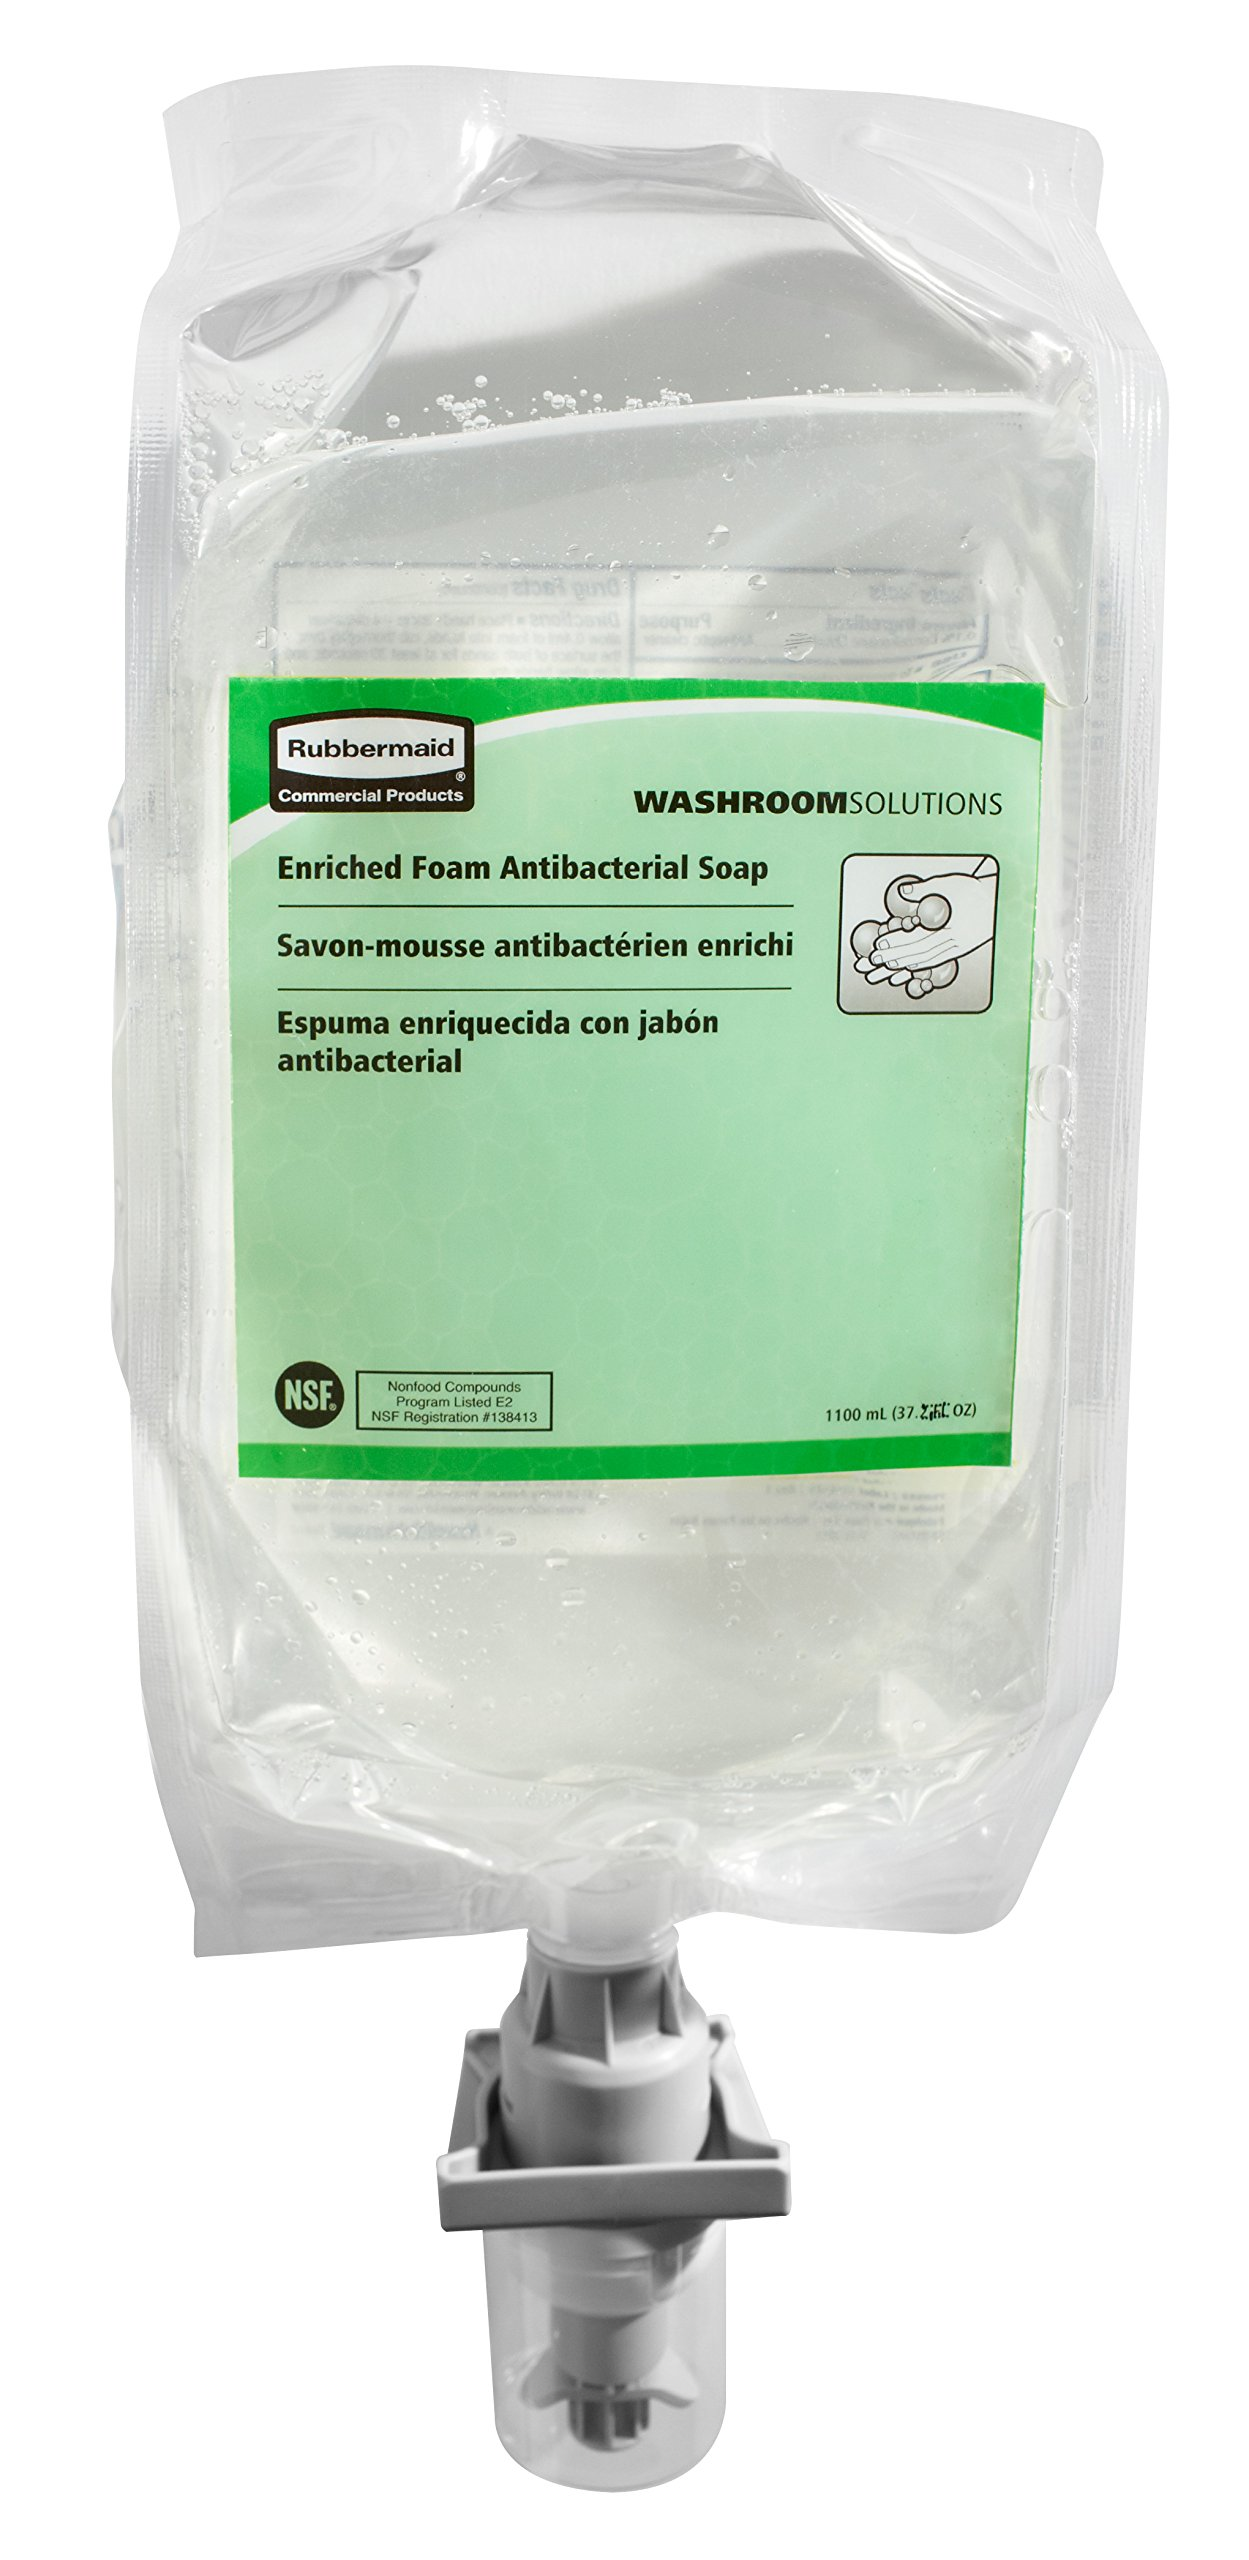 Rubbermaid Commercial Enriched Foam Antibacterial E2 Hand Soap, 1100 ml (FG750111)